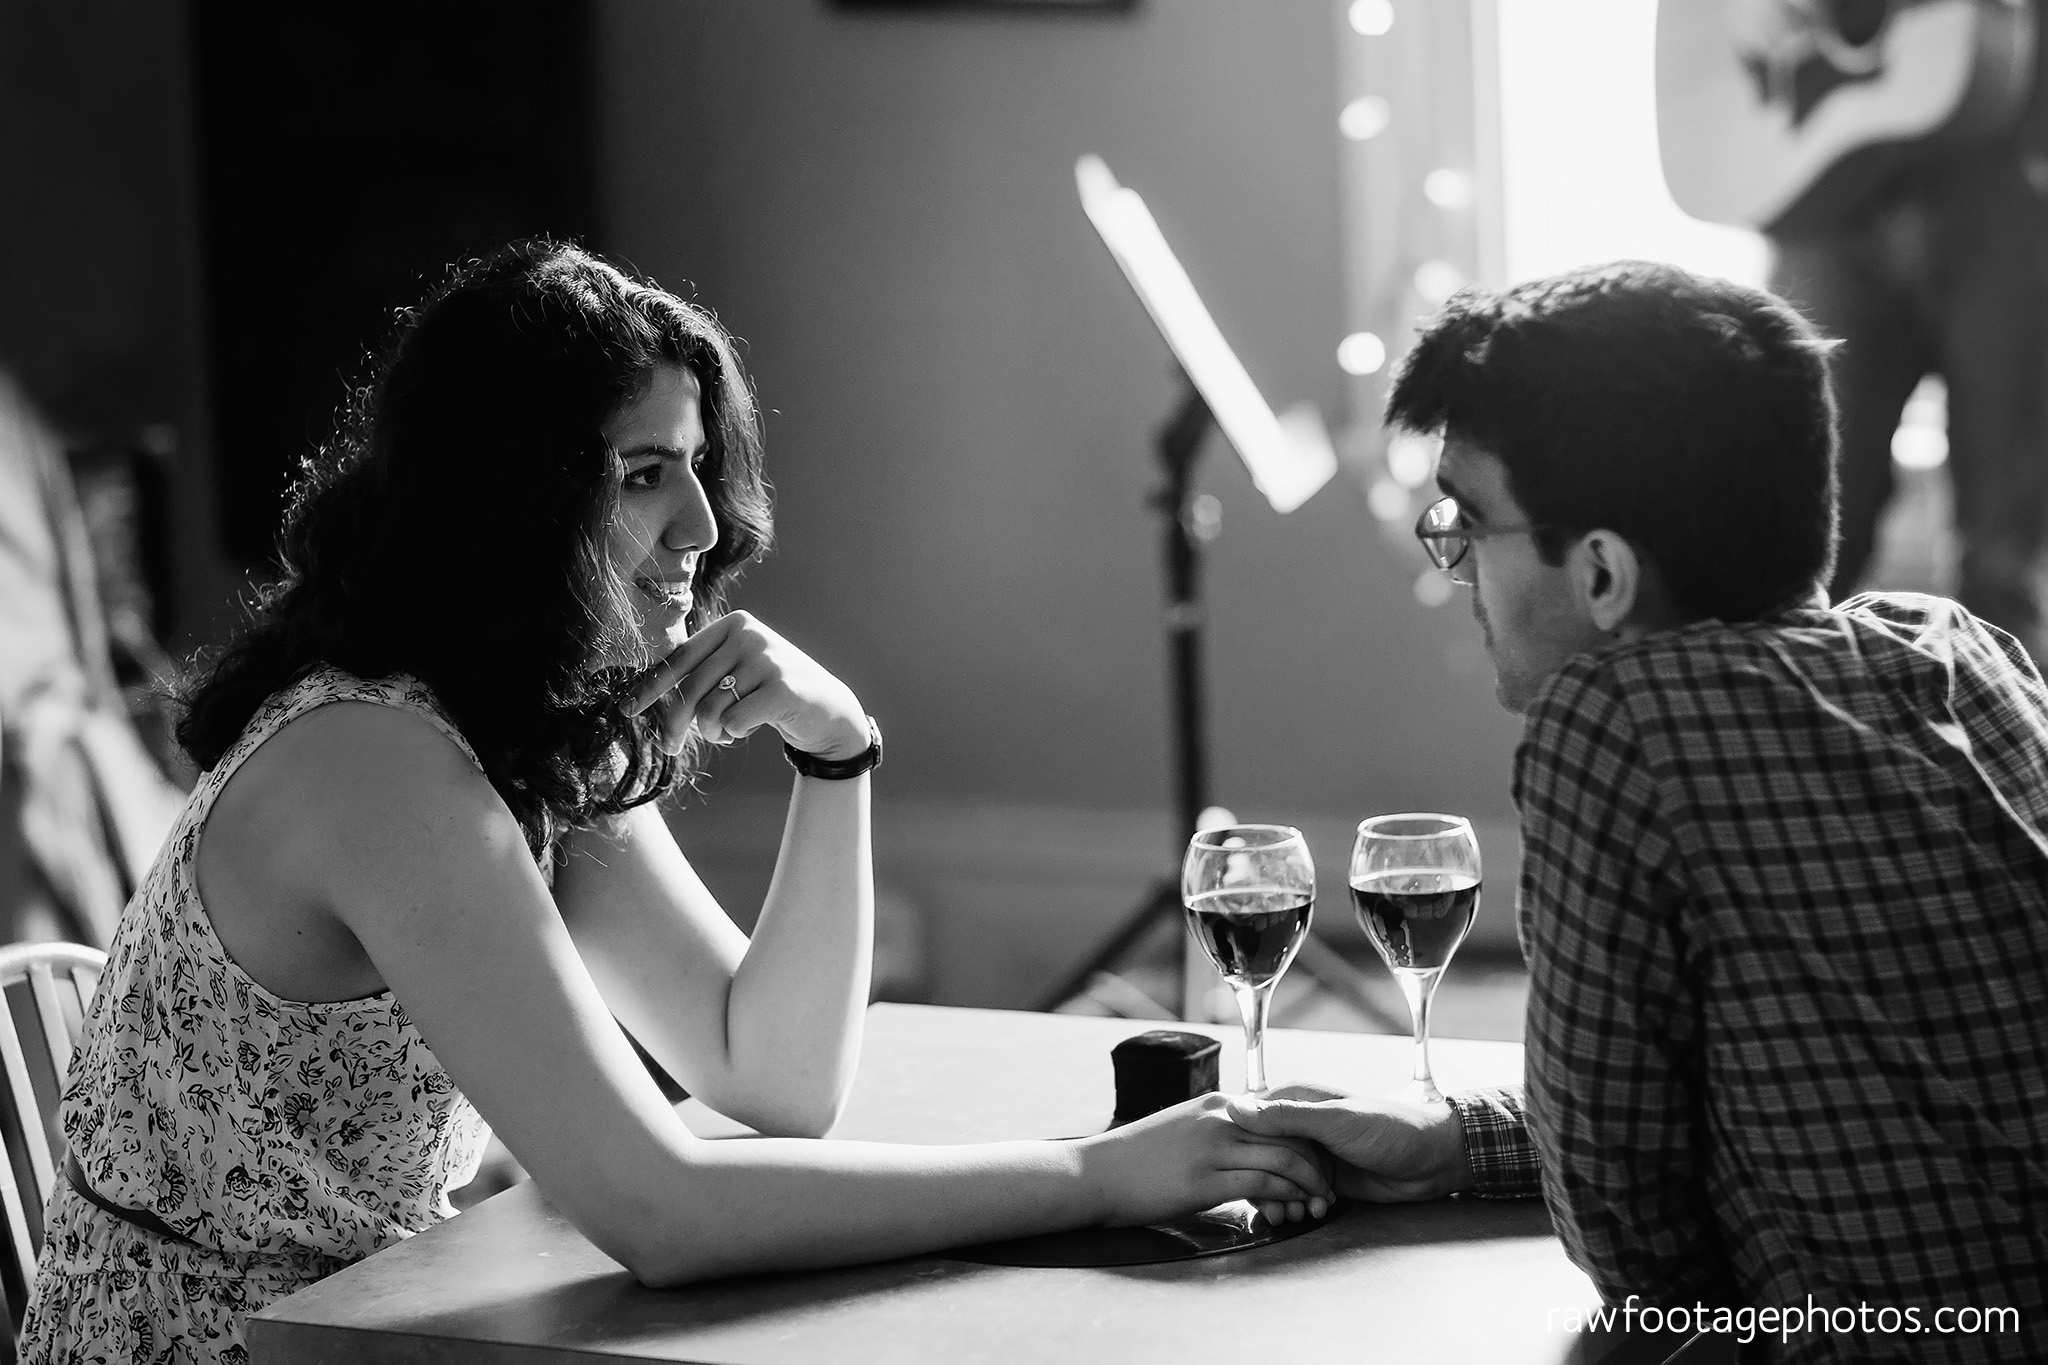 london_ontario_photographer-proposal_photographer-surprise_proposal-london_music_club-raw_footage_photography-wedding_photographer010.jpg